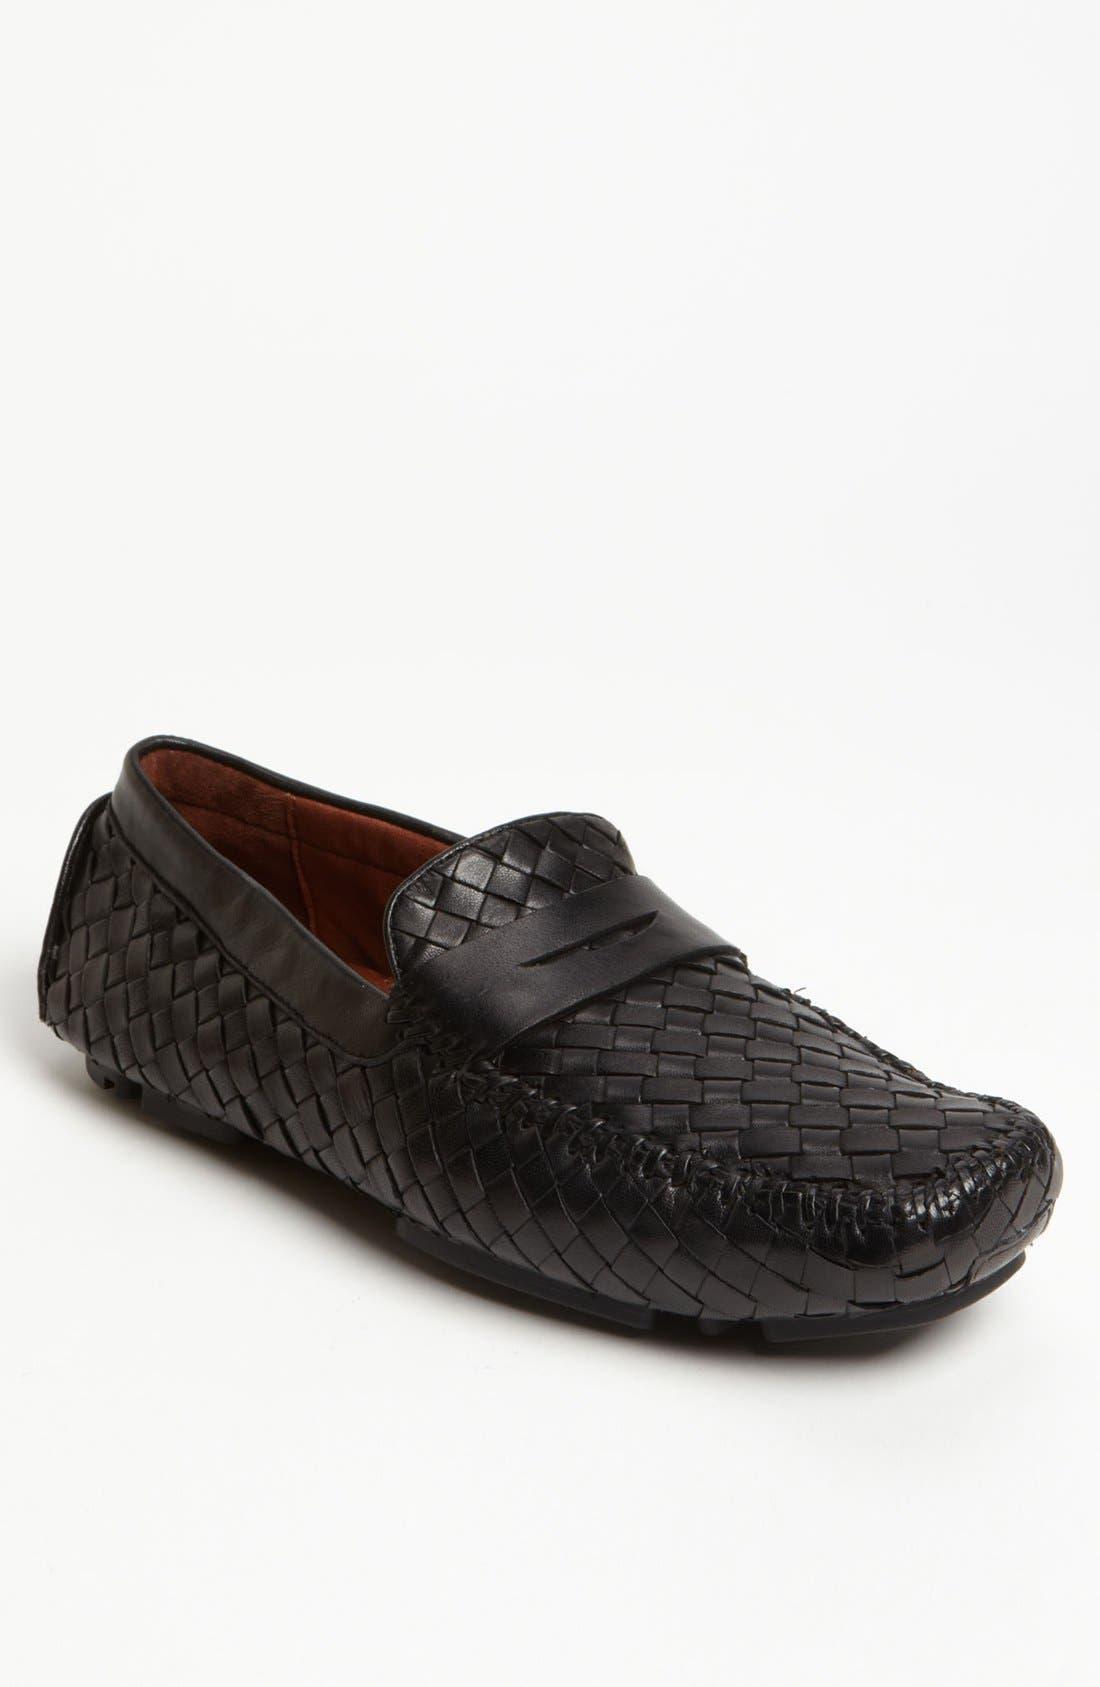 'San Tropez' Penny Loafer,                         Main,                         color, Black